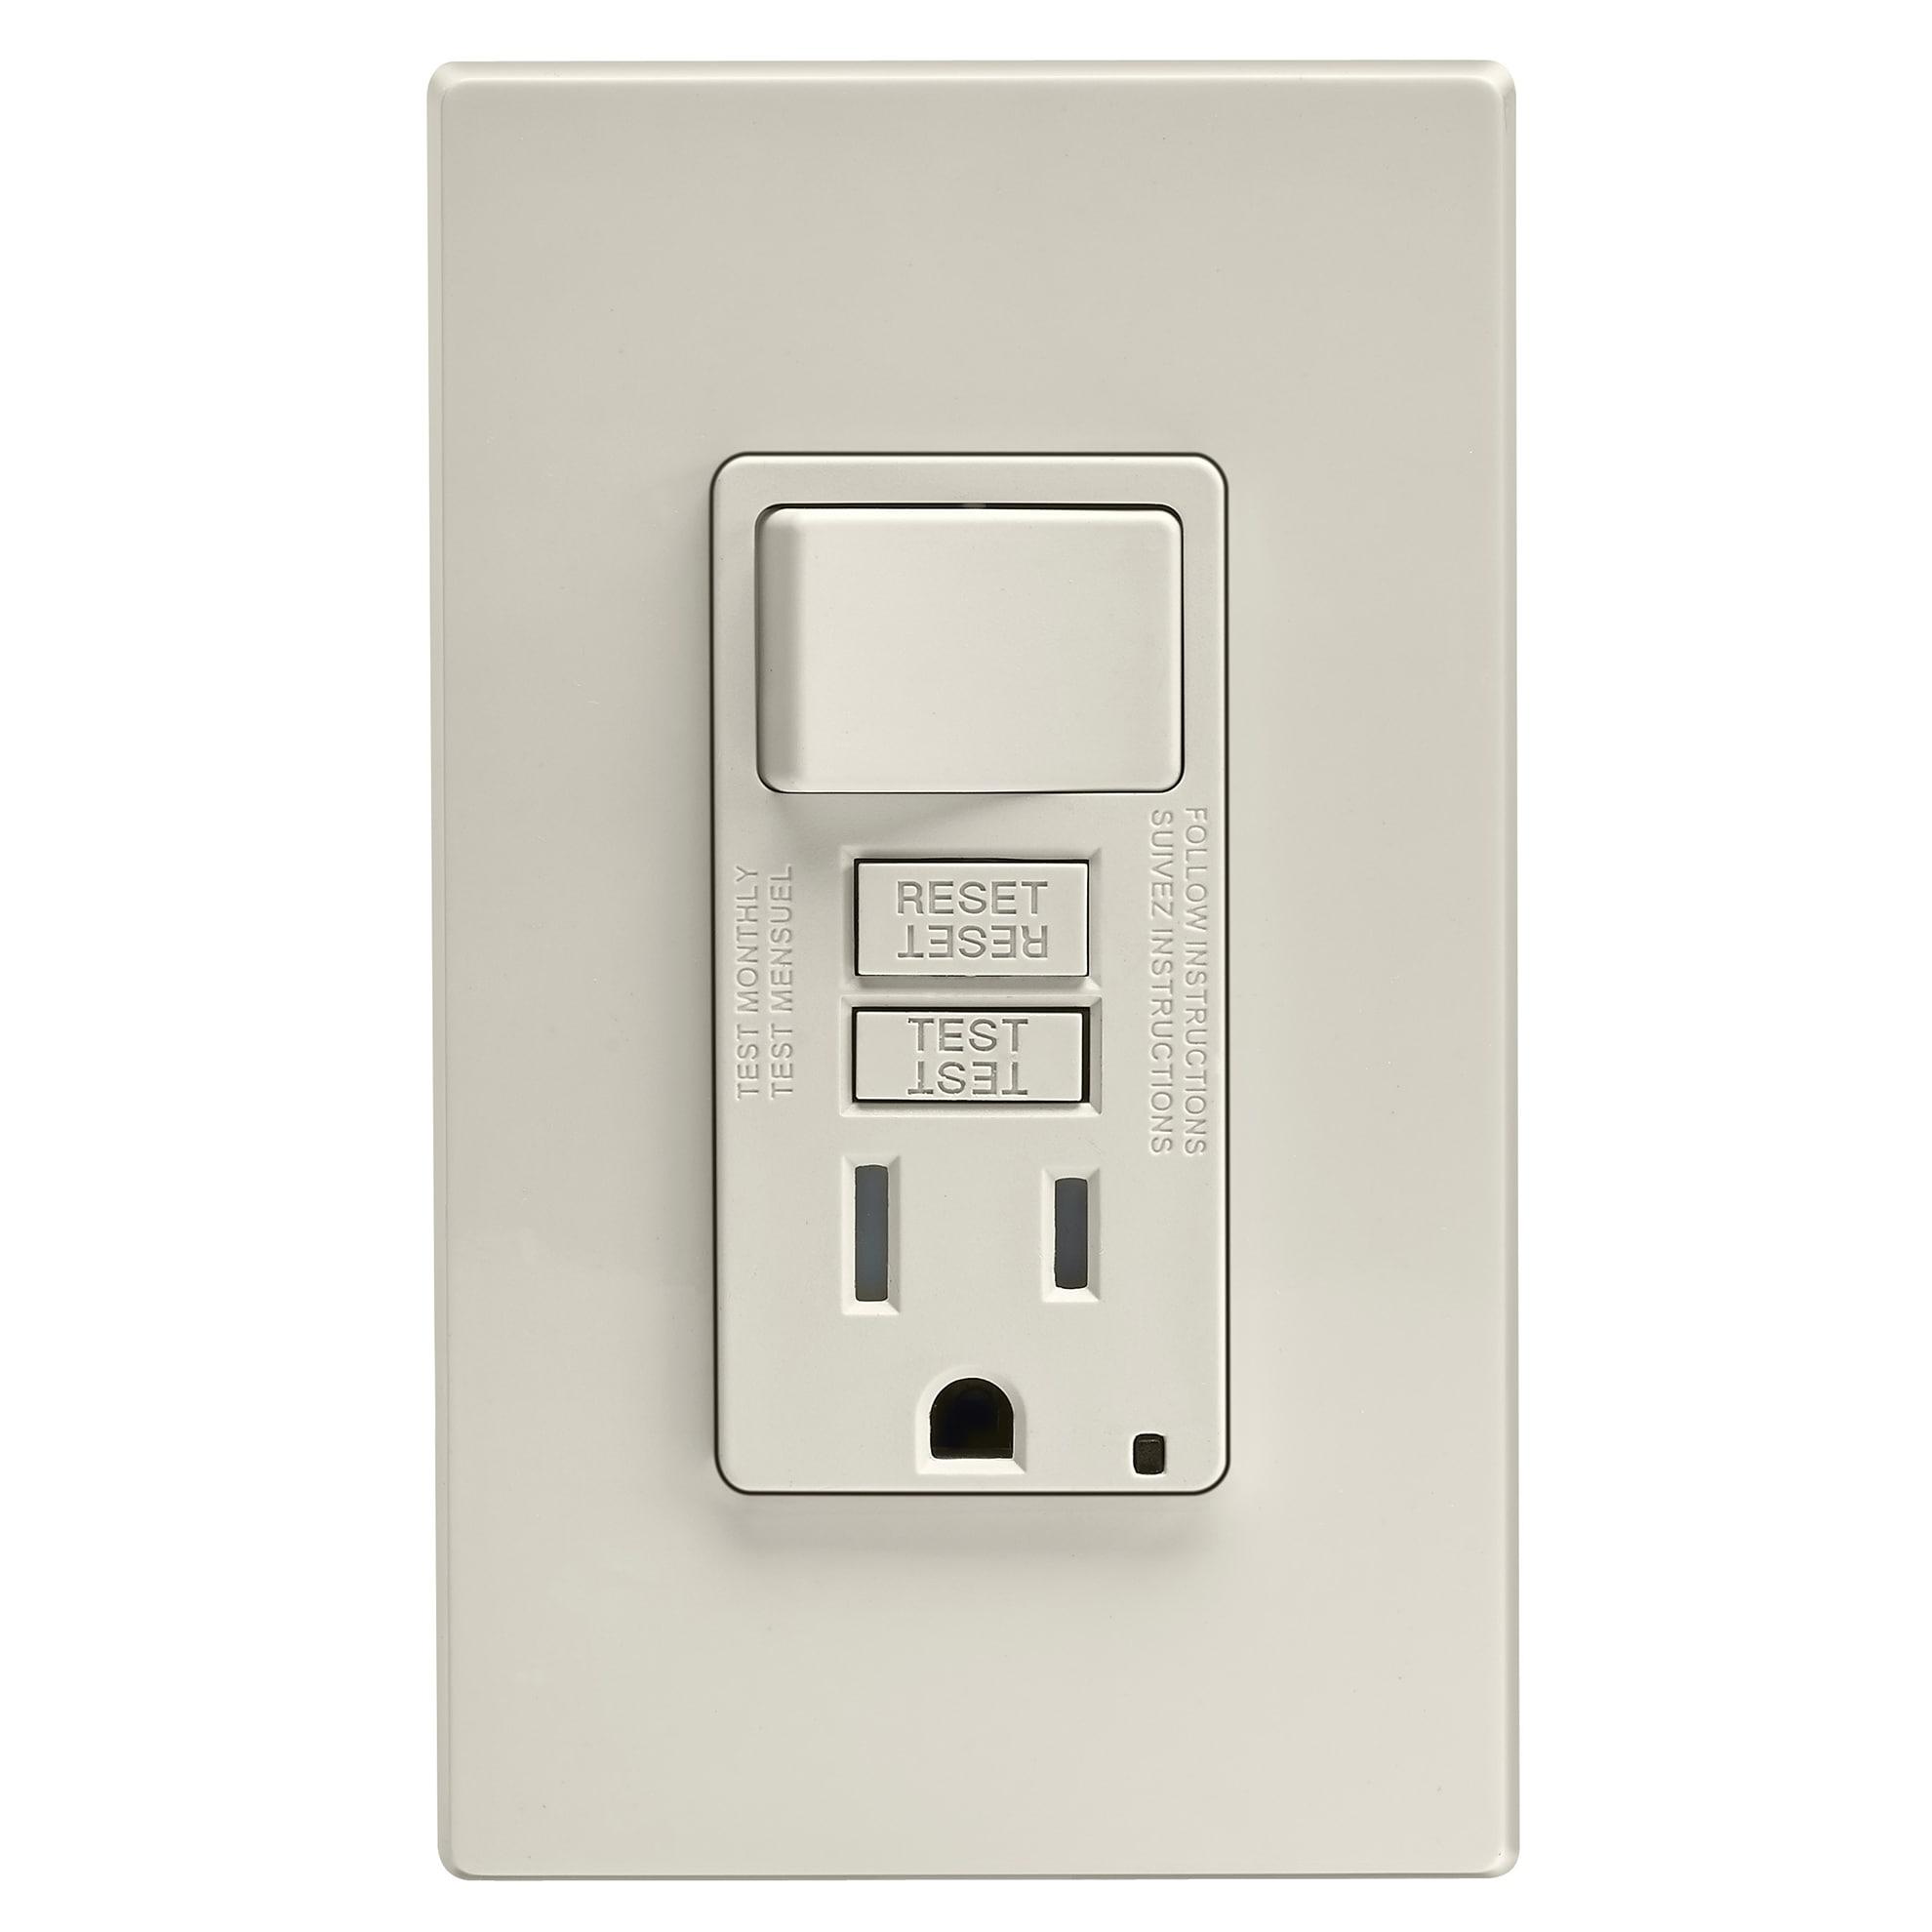 Leviton Gfci Receptacle 15 amps 5-15R 125 volts Light Alm...